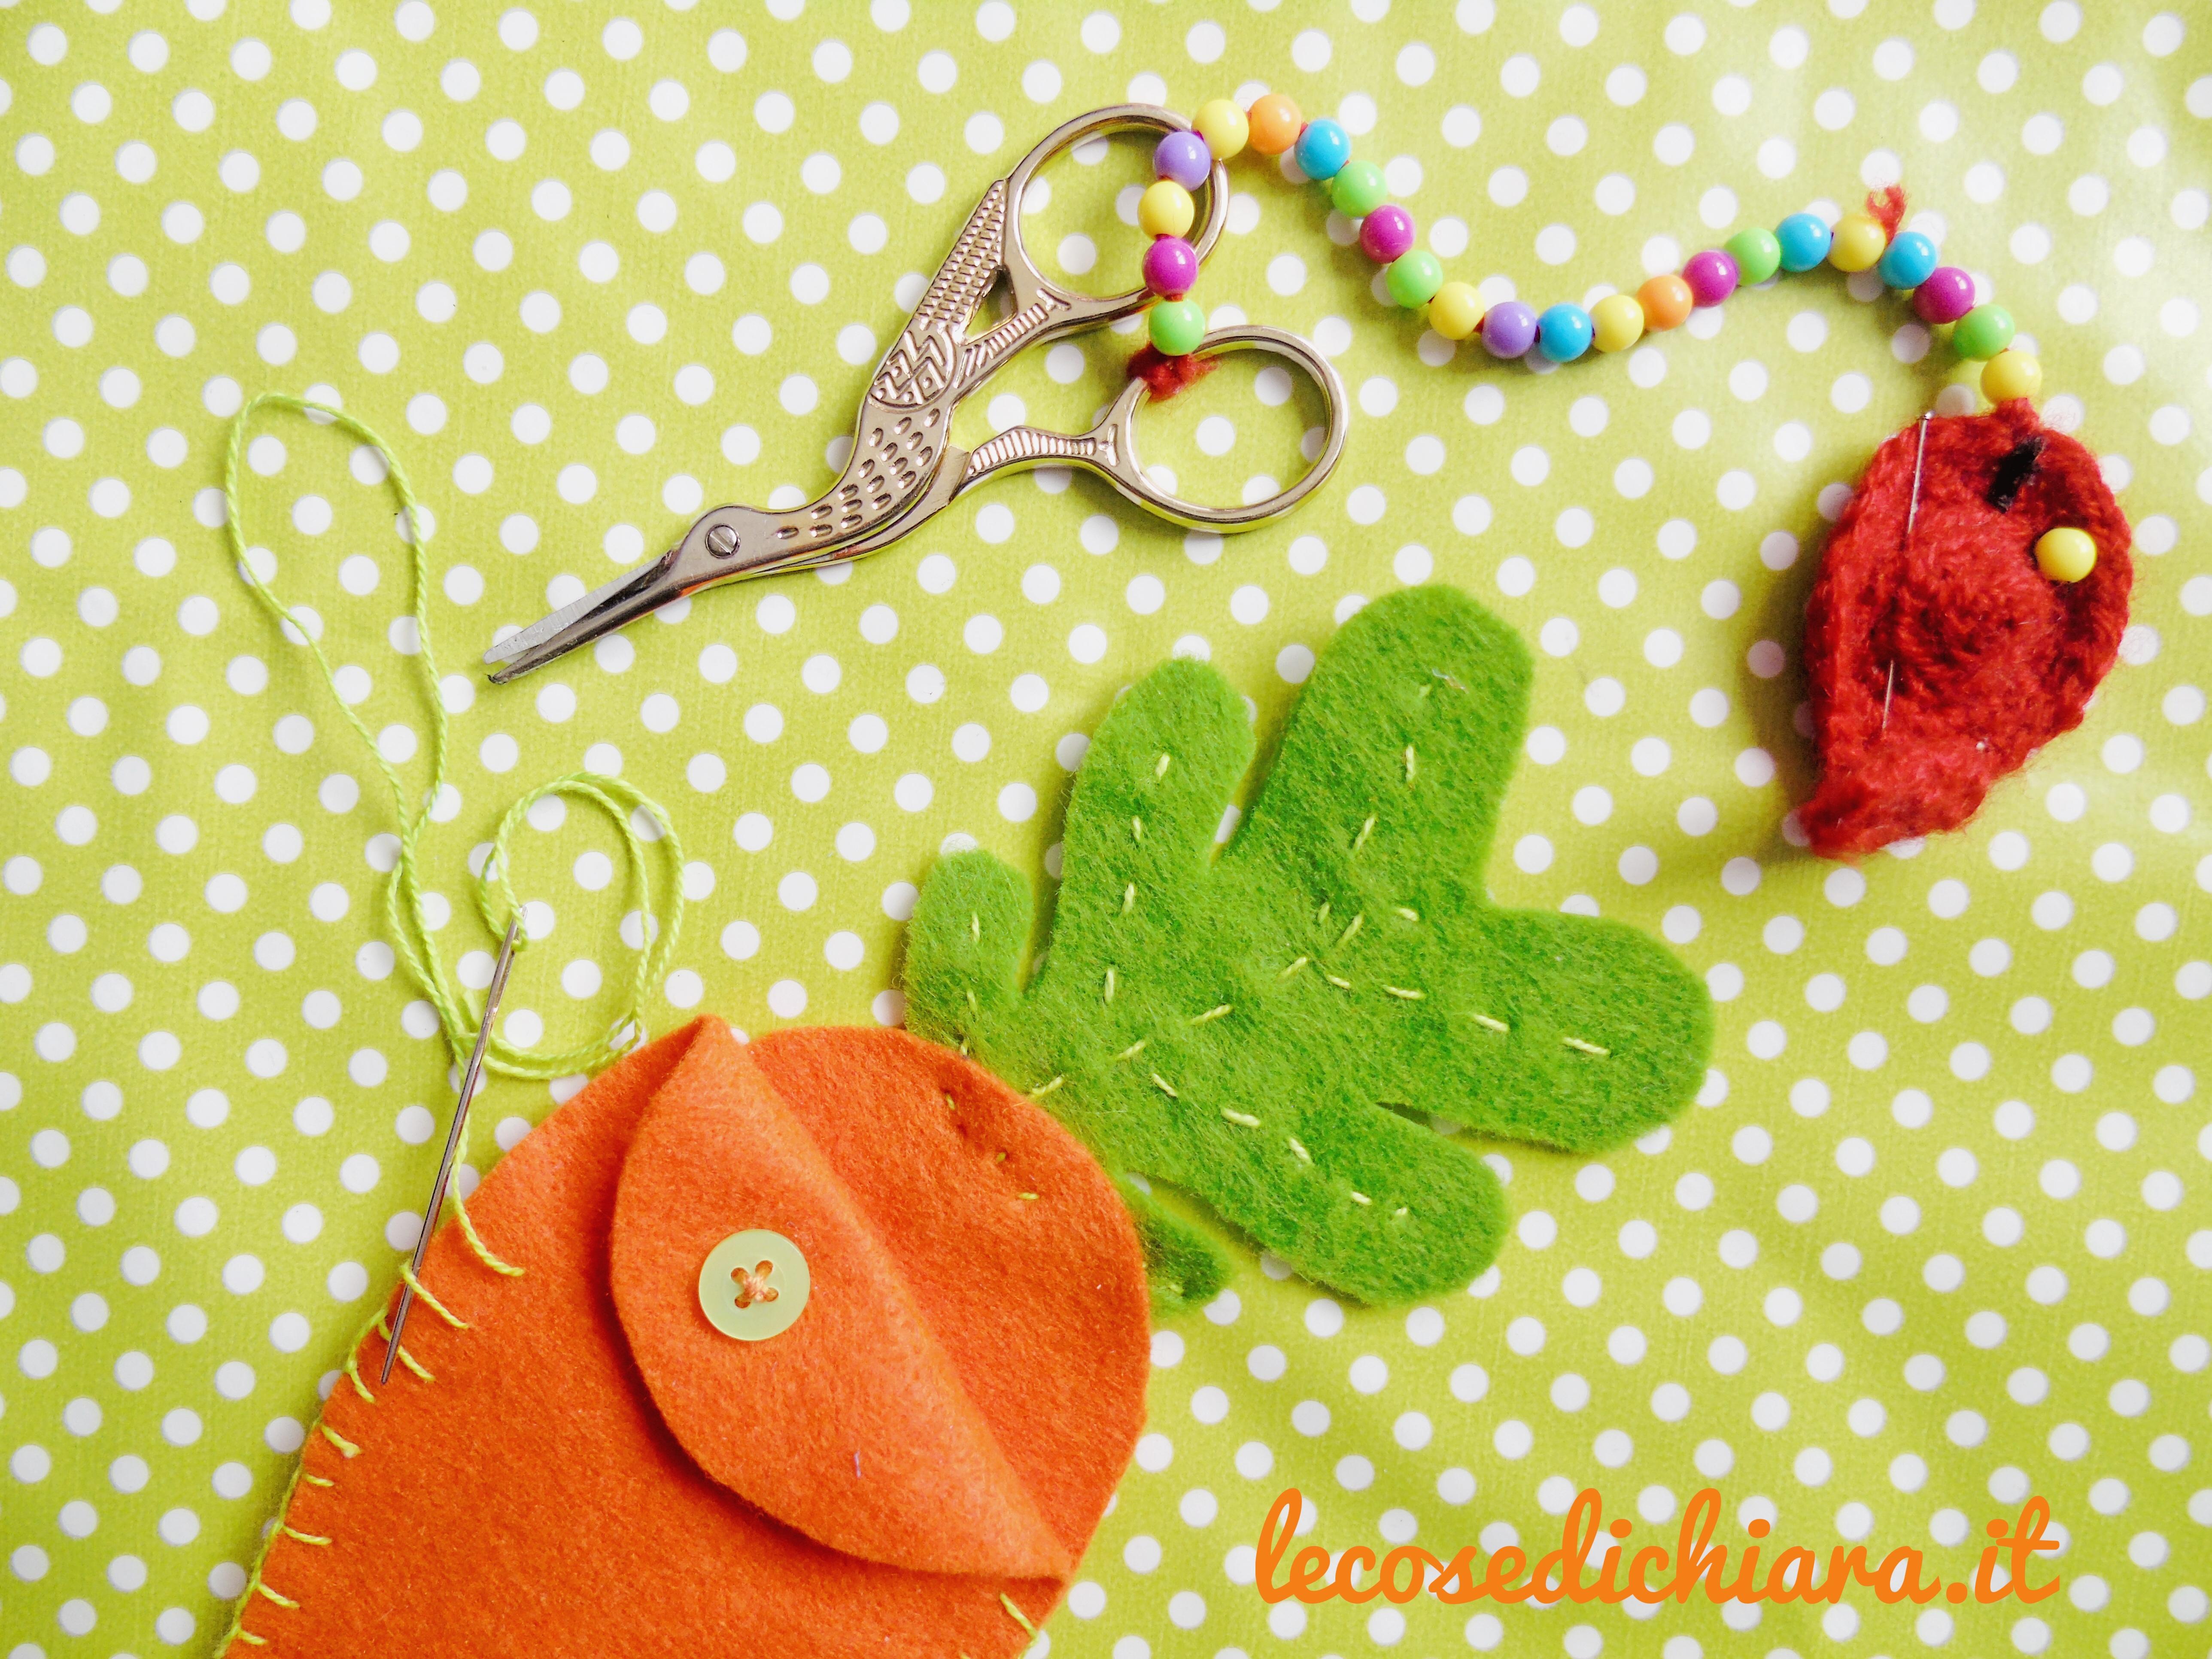 step-2-carote-per-pasqua-lecosedichiara-chiara-zenga